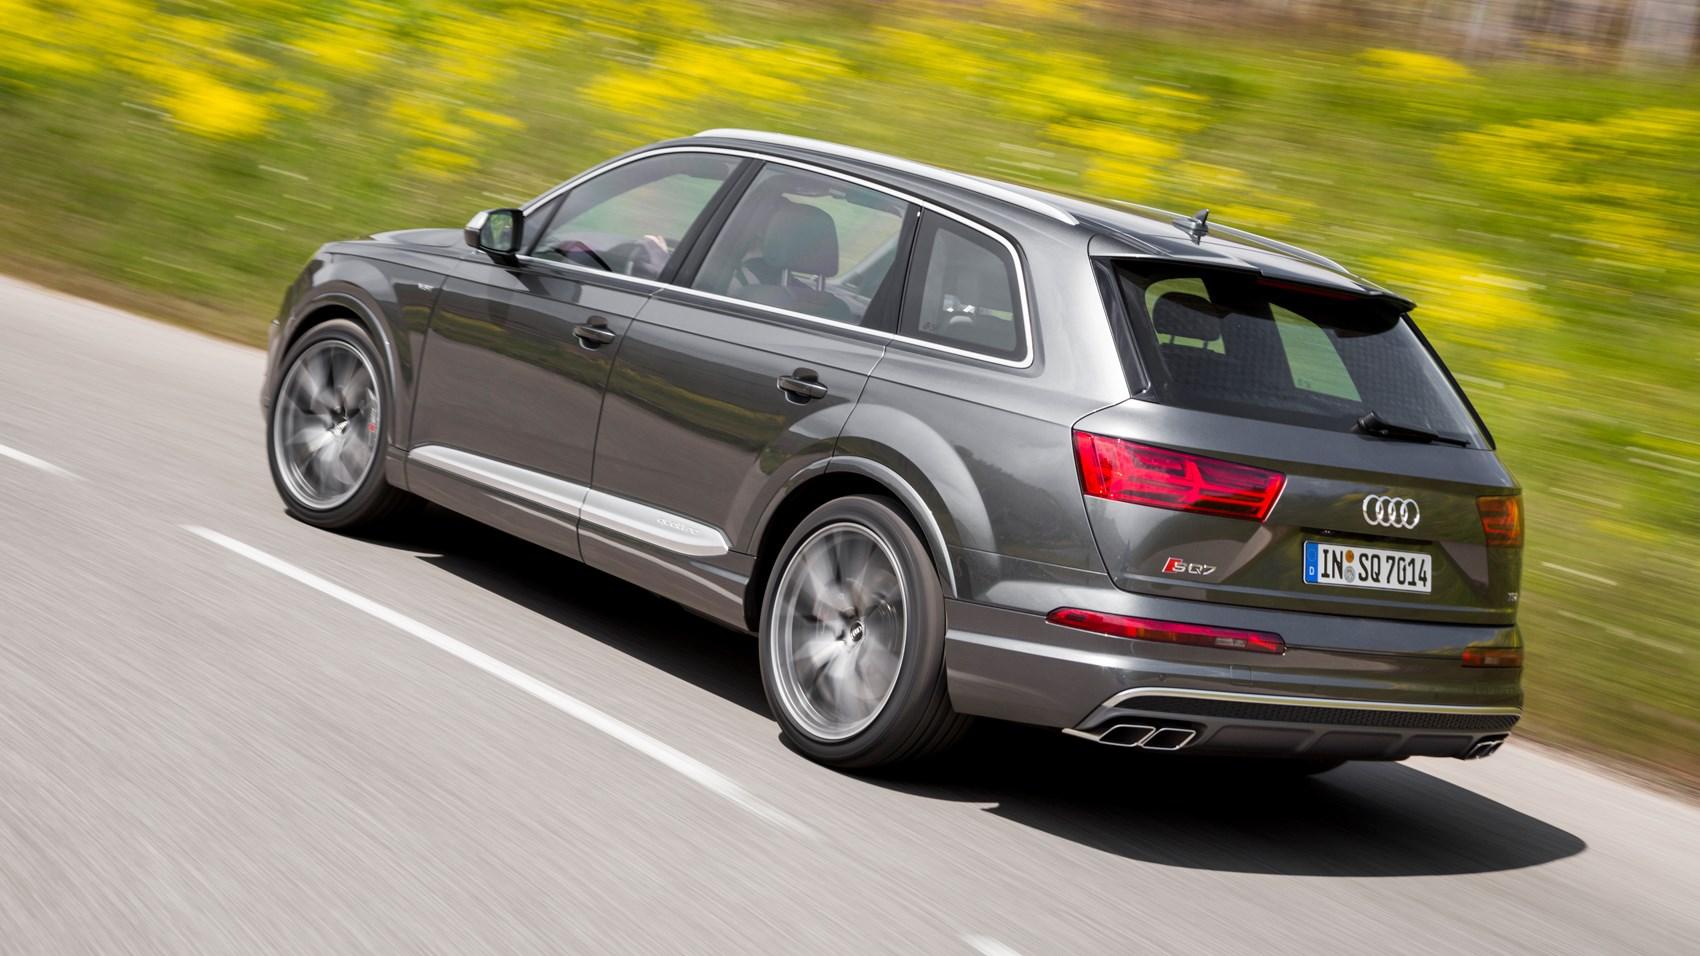 Audi Sq7 Tdi 2016 Review By Car Magazine